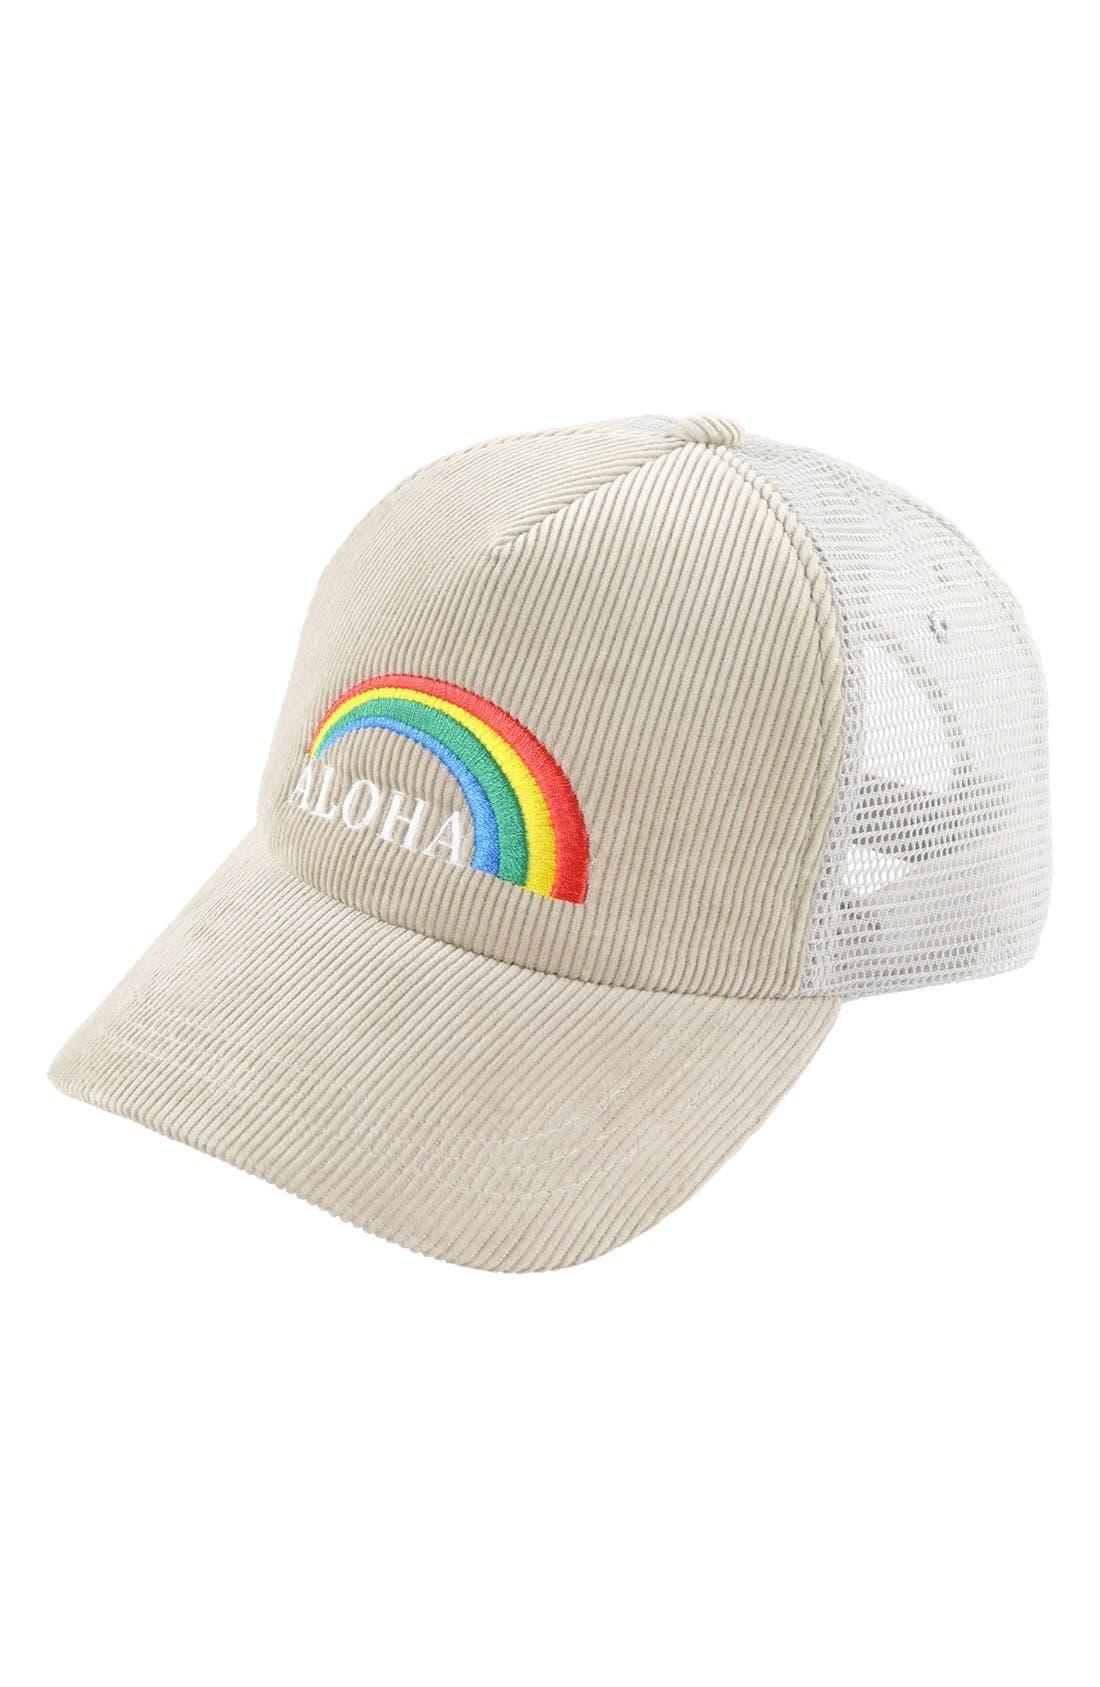 Alternate Image 1 Selected - O'Neill 'Aloha' Corduroy Trucker Hat